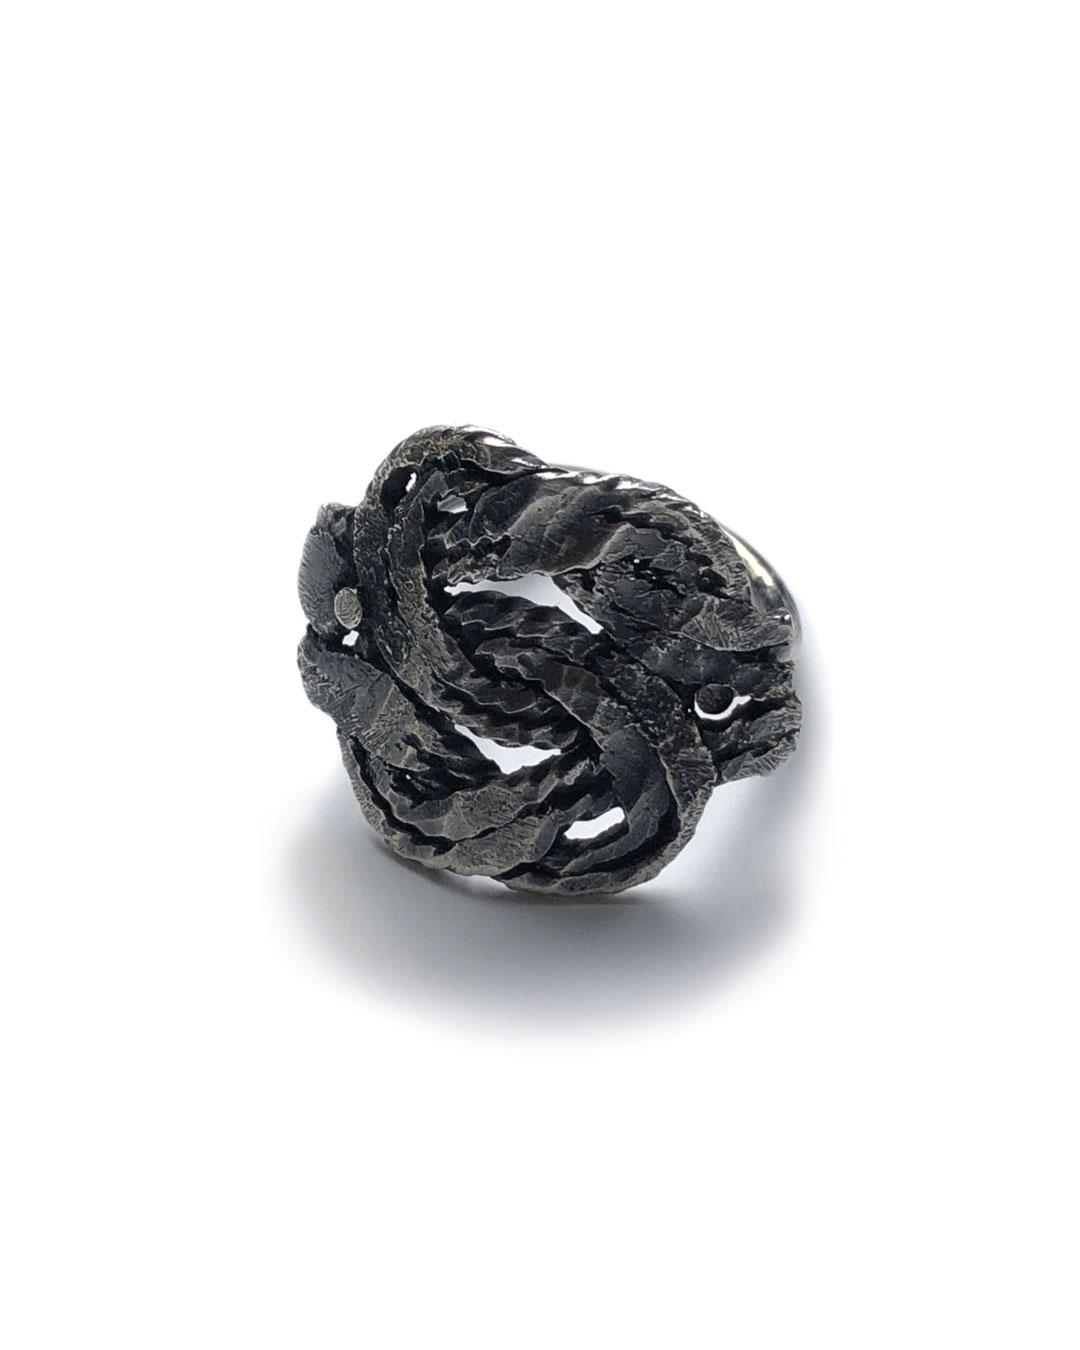 Chequita Nahar, Matti, 2017, ring; silver, 22 x 22 x 19 mm, €295